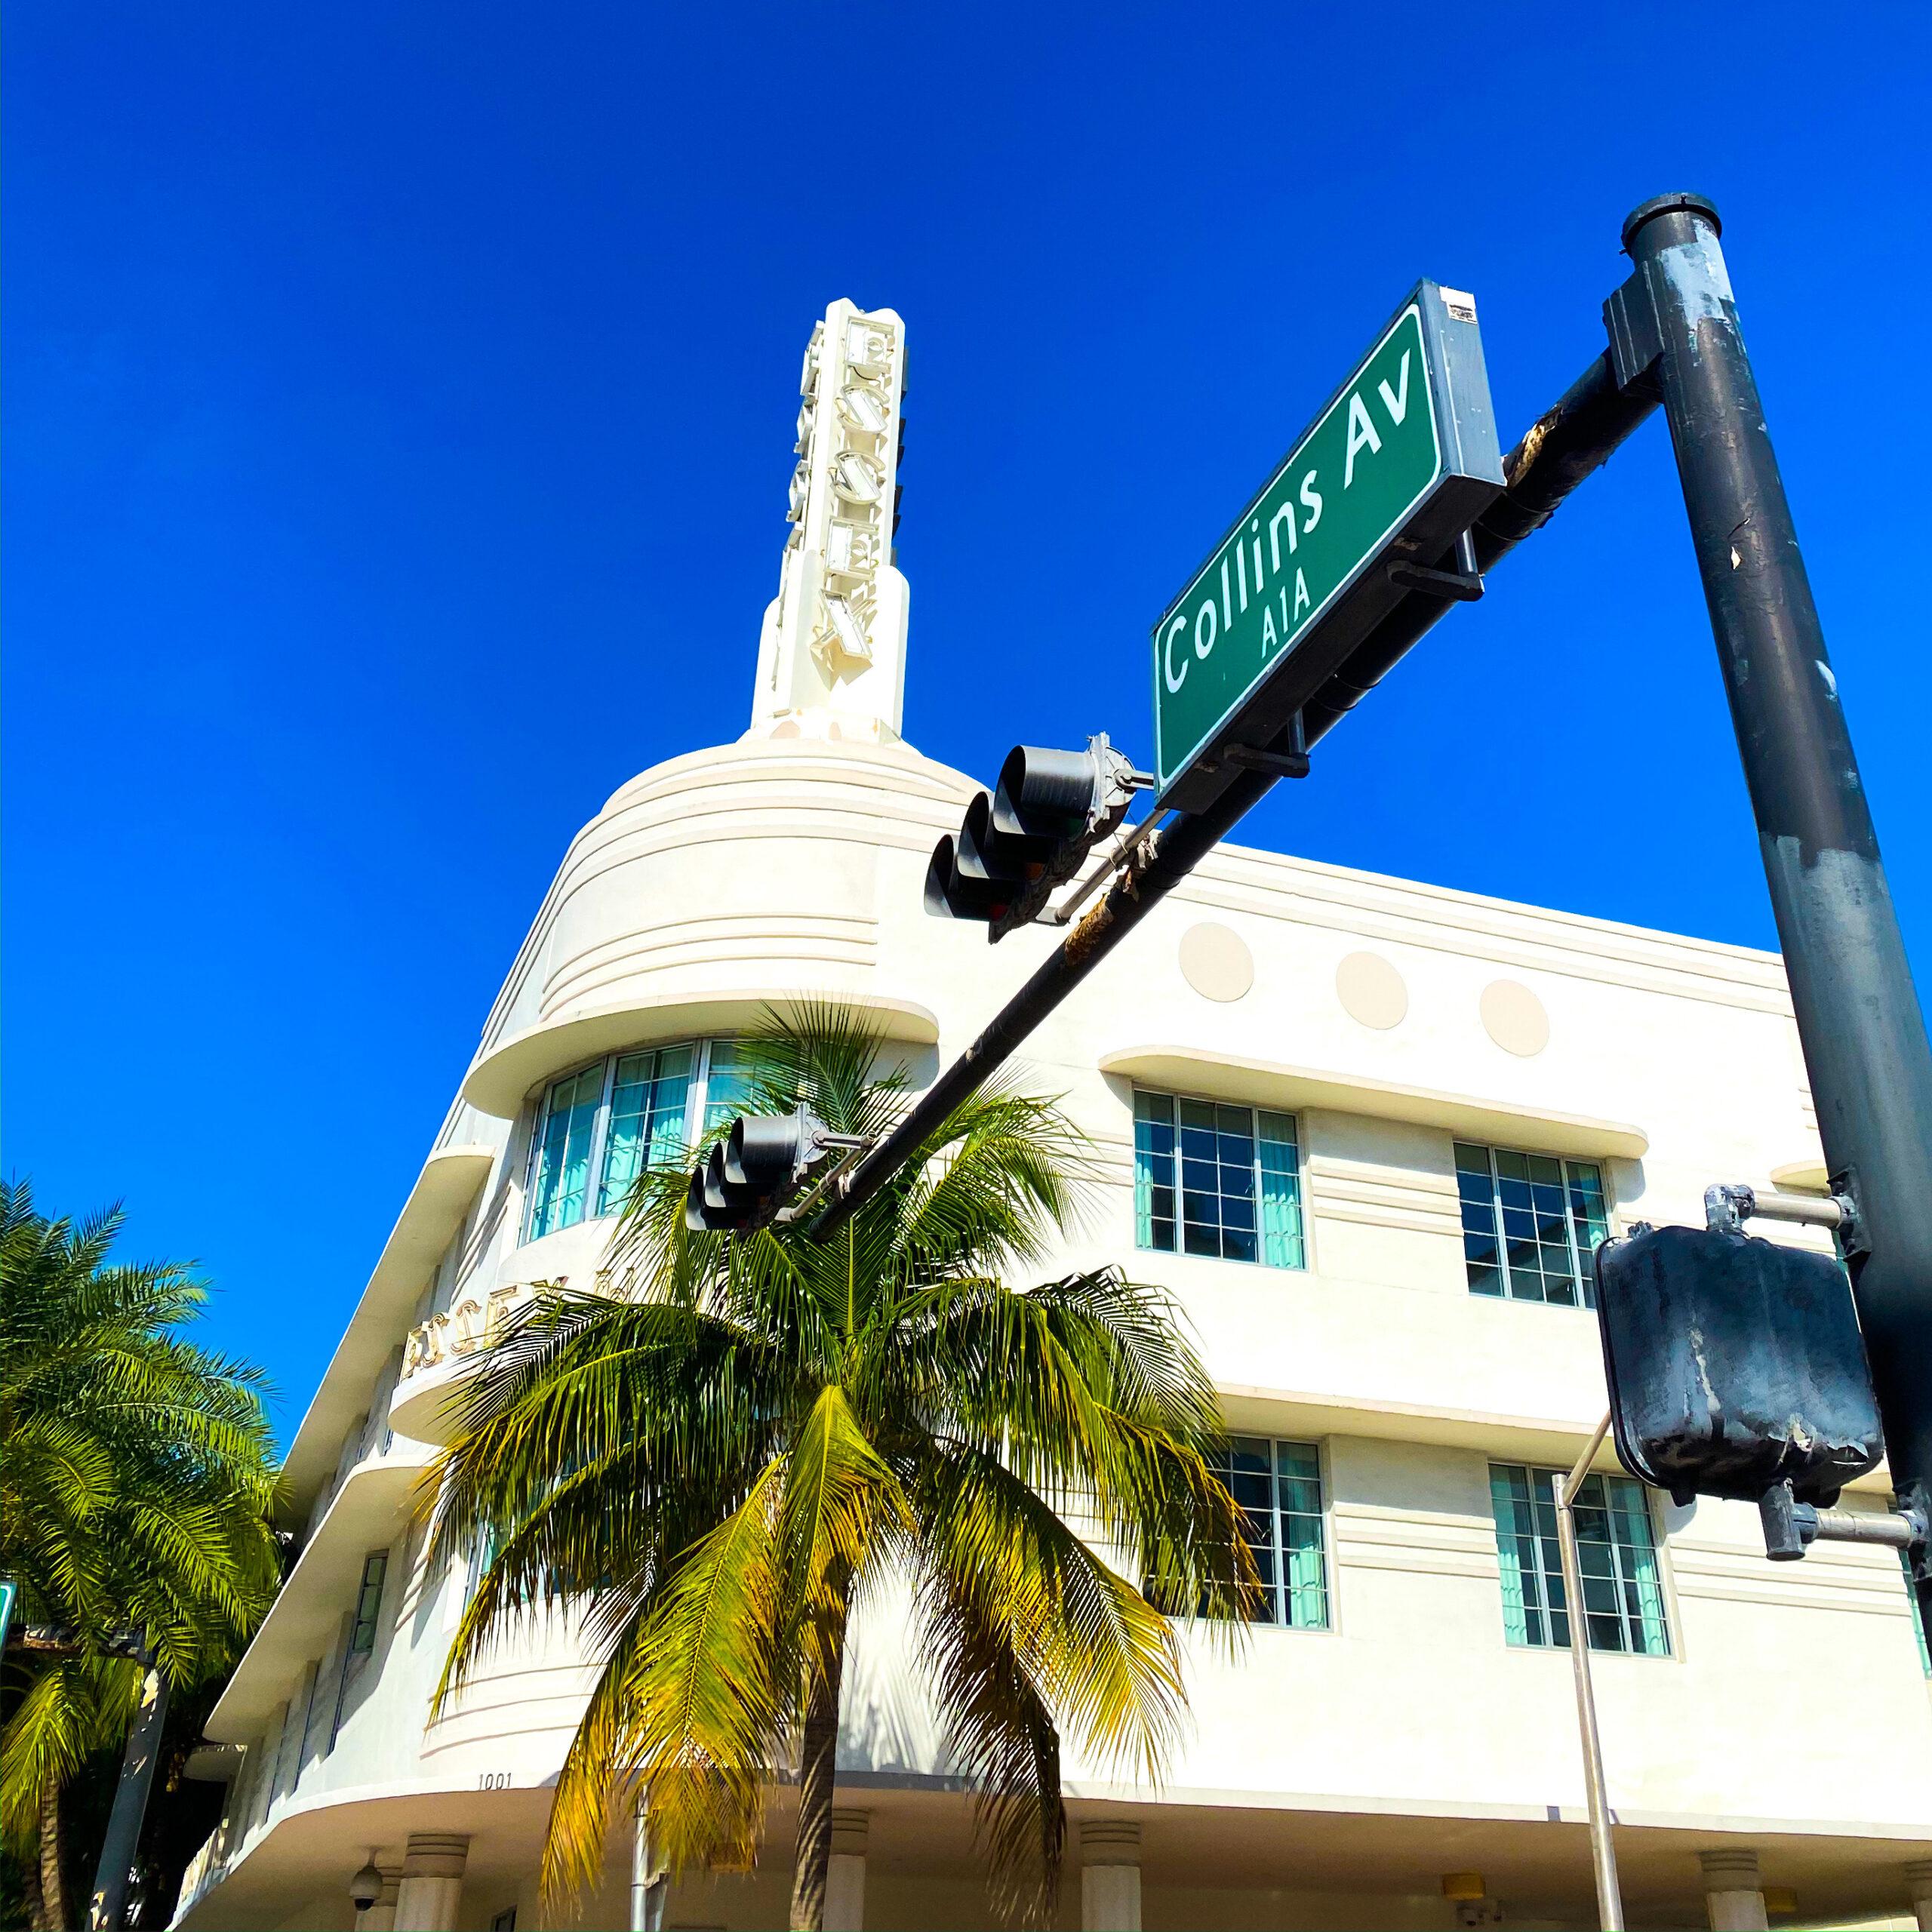 Miami Beach: Always a Circus